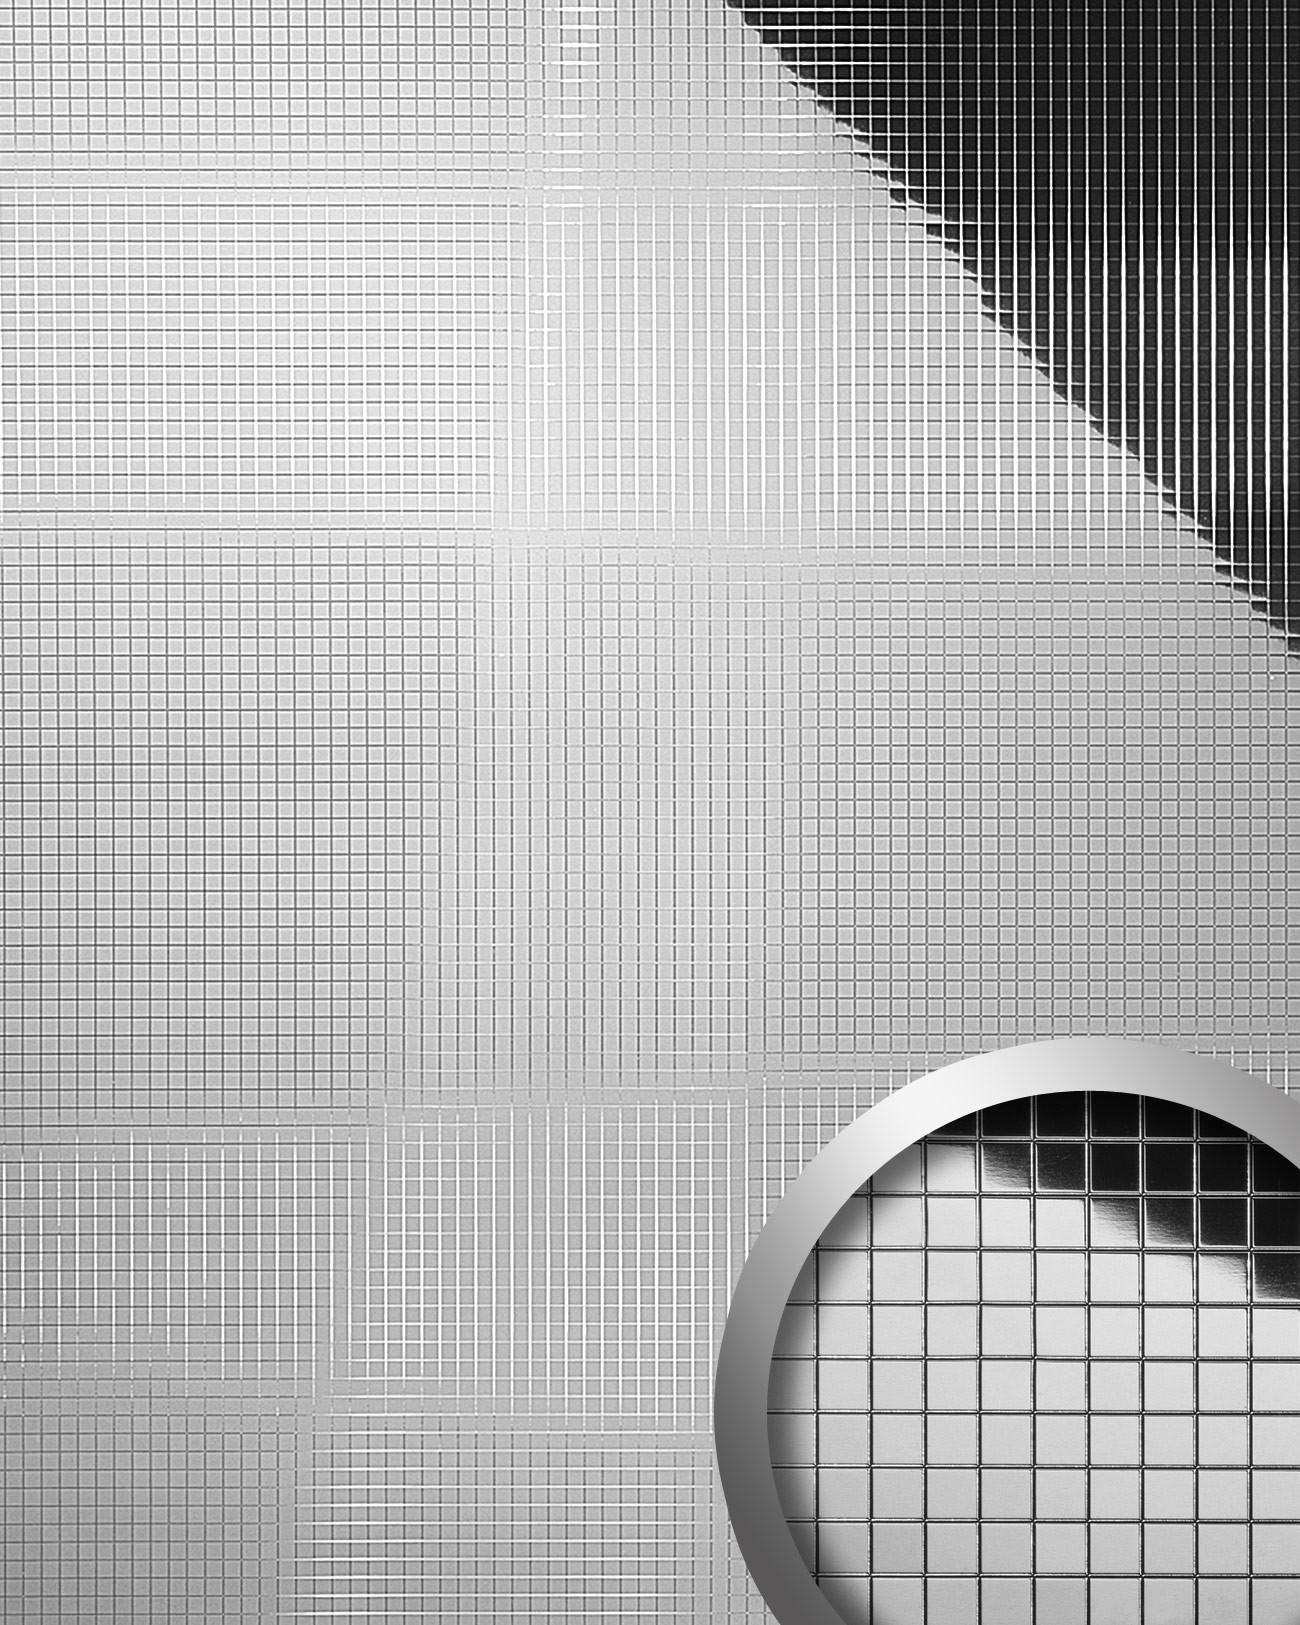 wandpaneel wandverkleidung wallface 10657 m style design. Black Bedroom Furniture Sets. Home Design Ideas